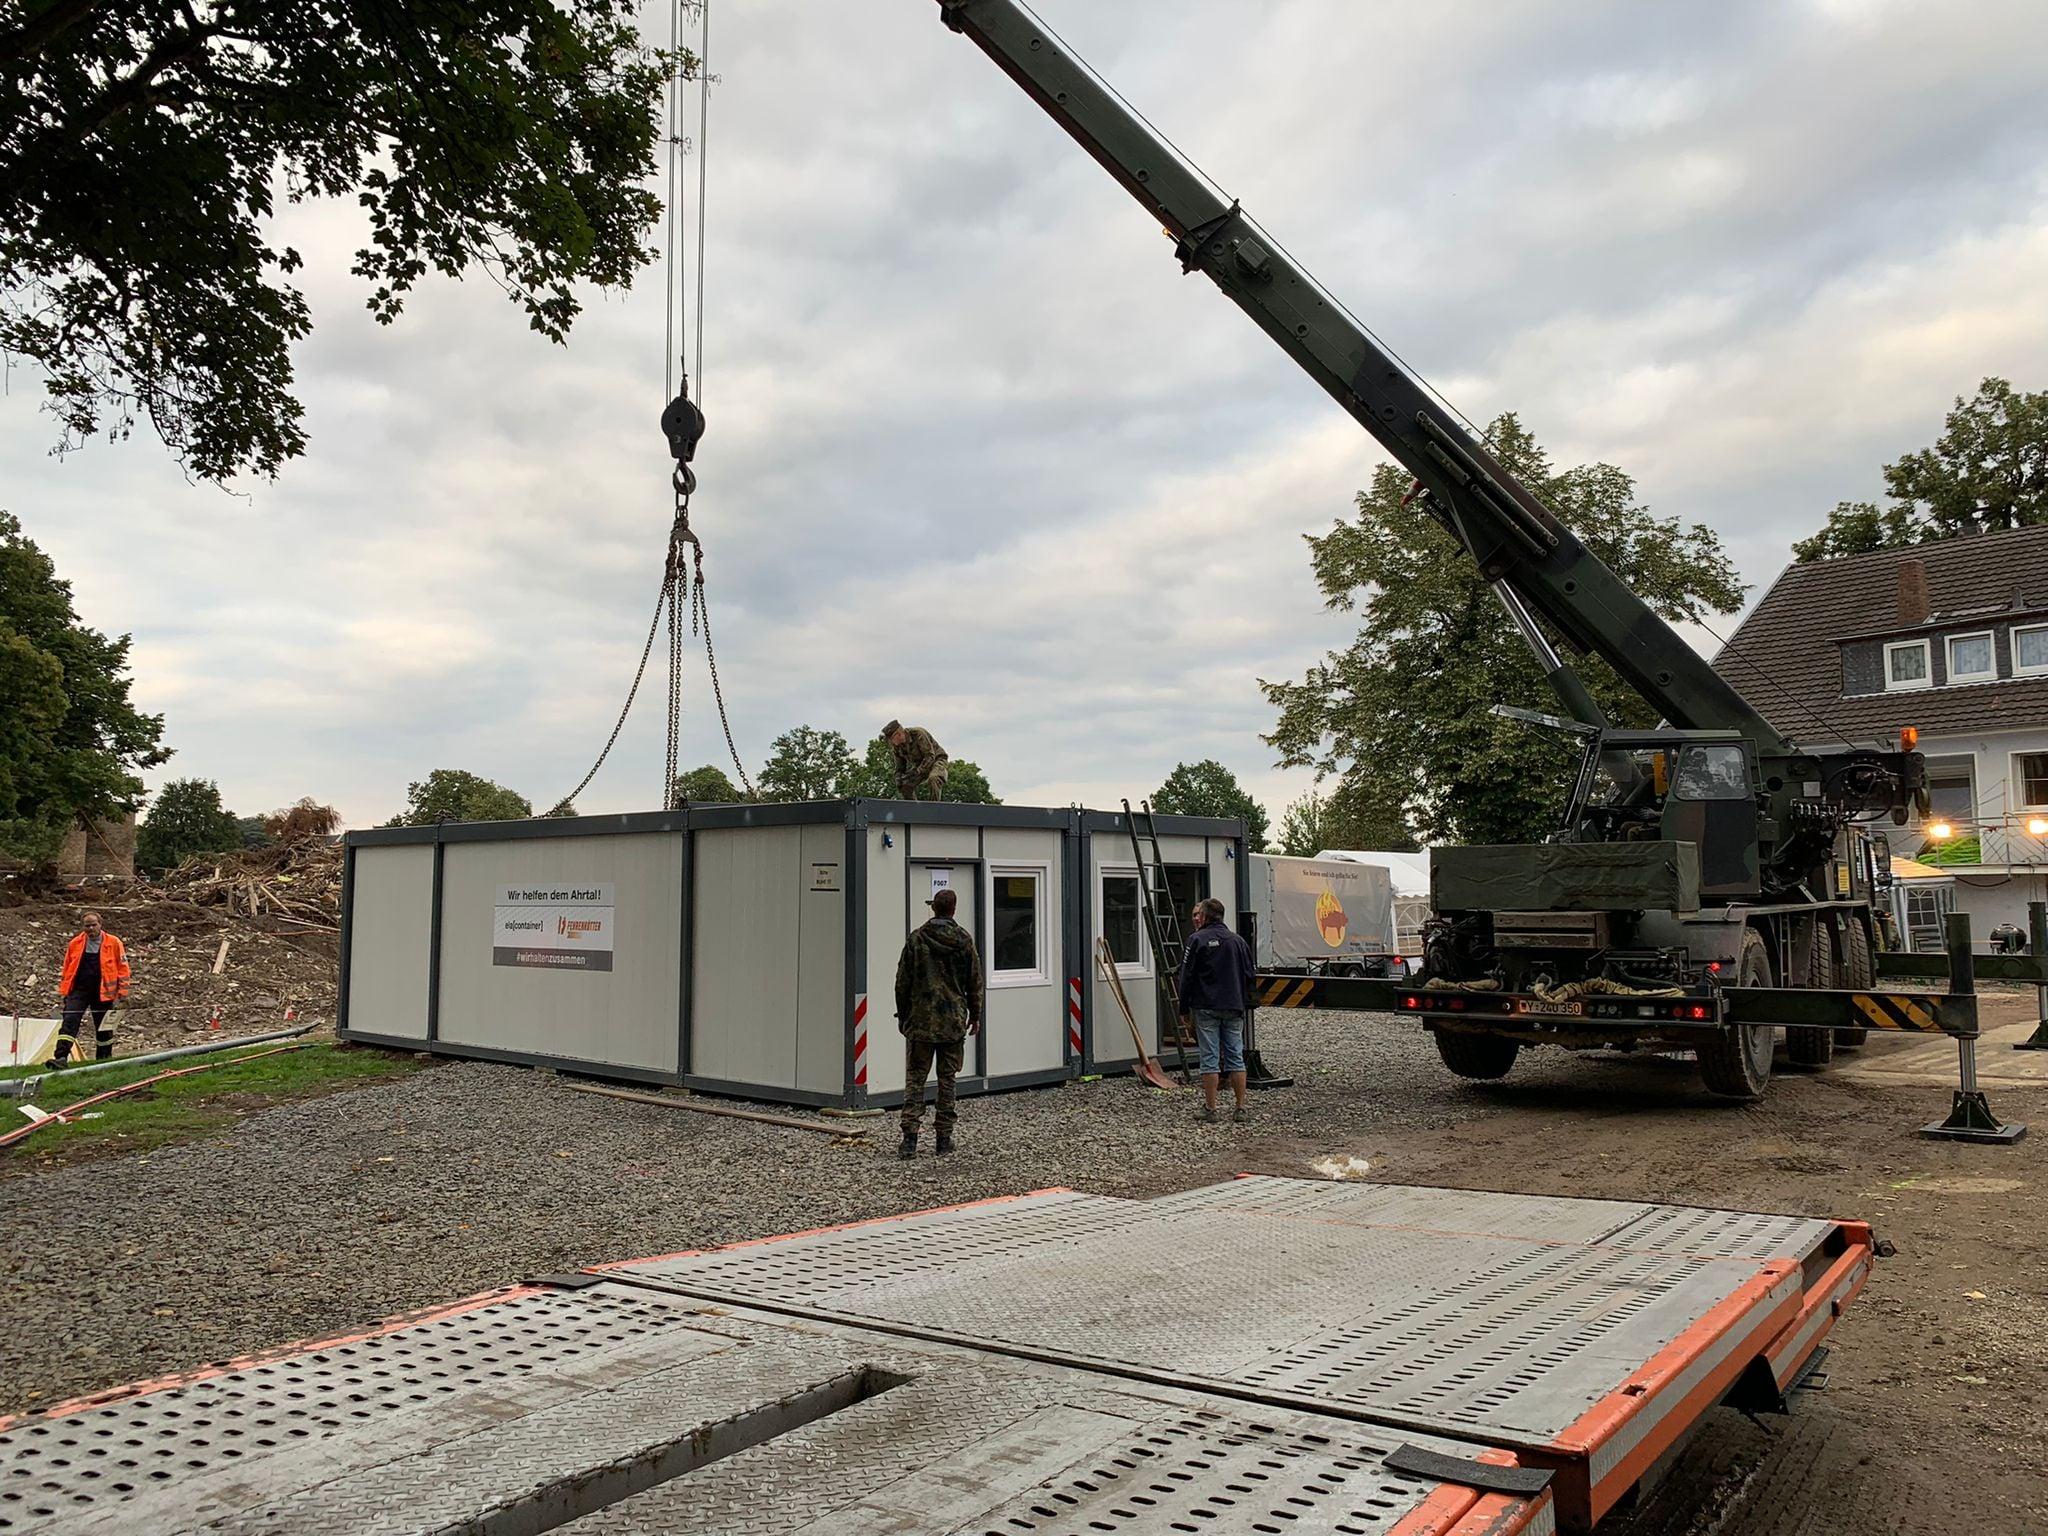 17-8-2021-Ahrtal-wohn-container-(4)